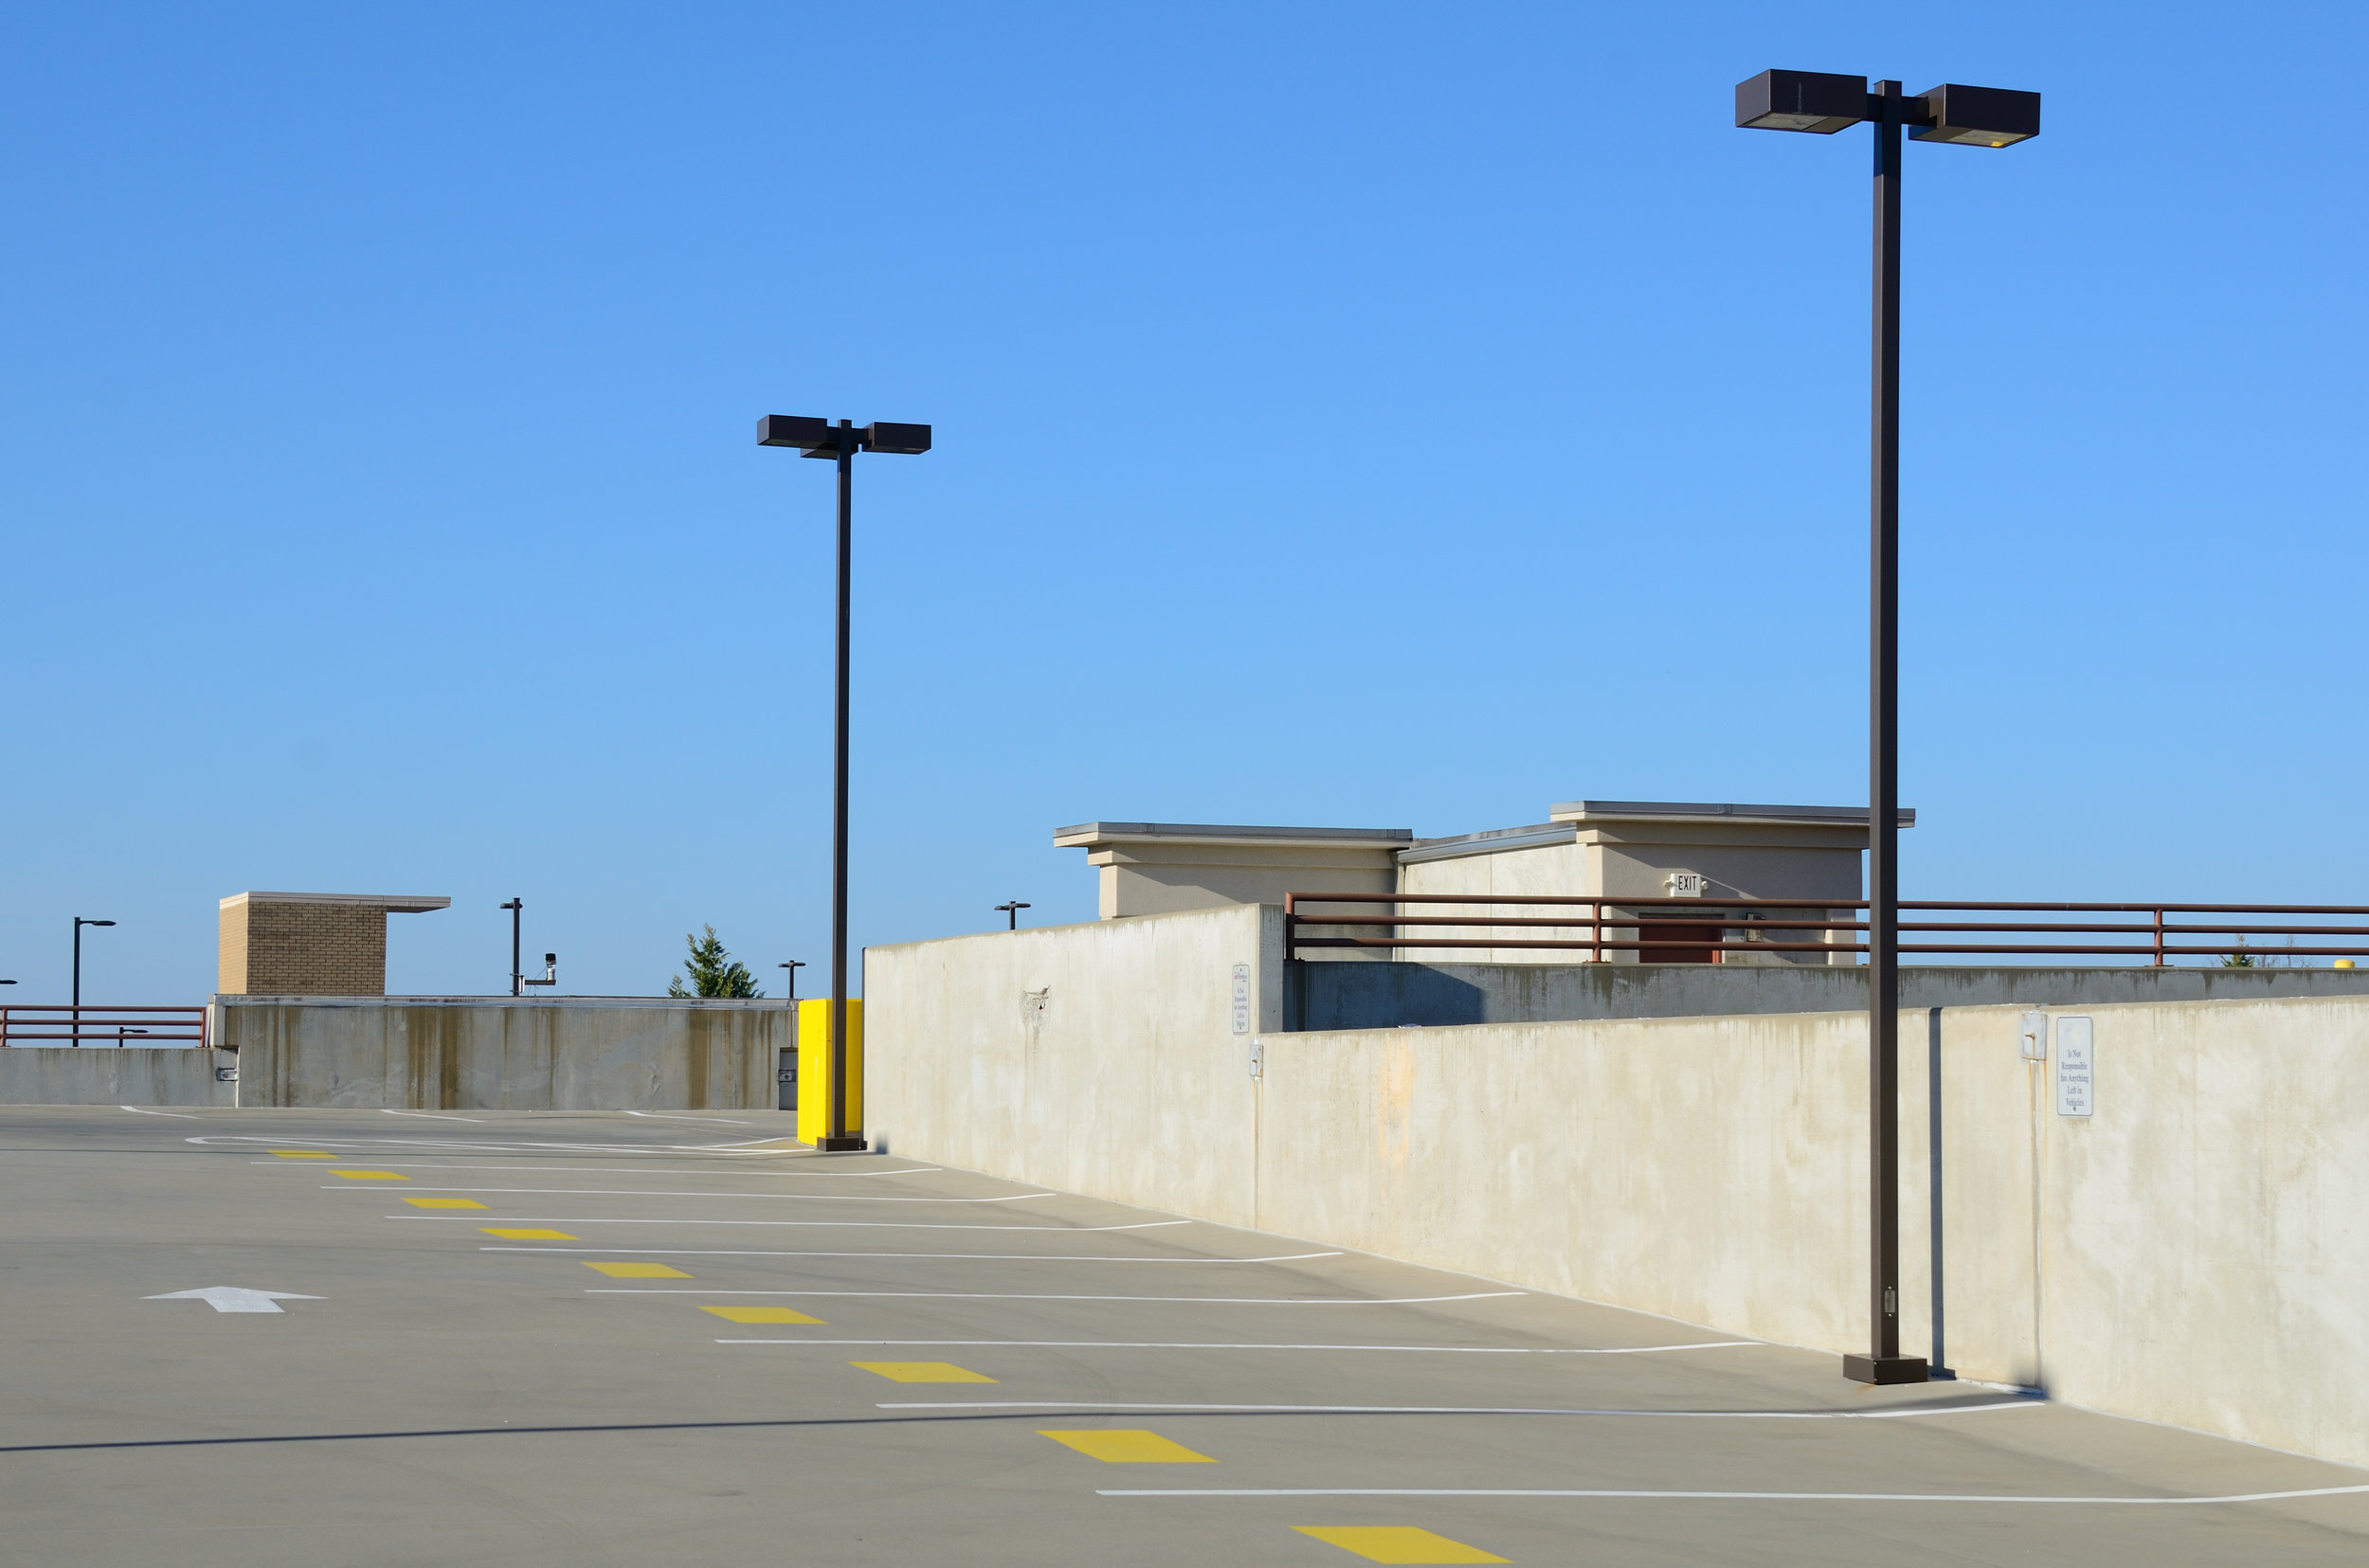 parking lot lights_72678598.jpg